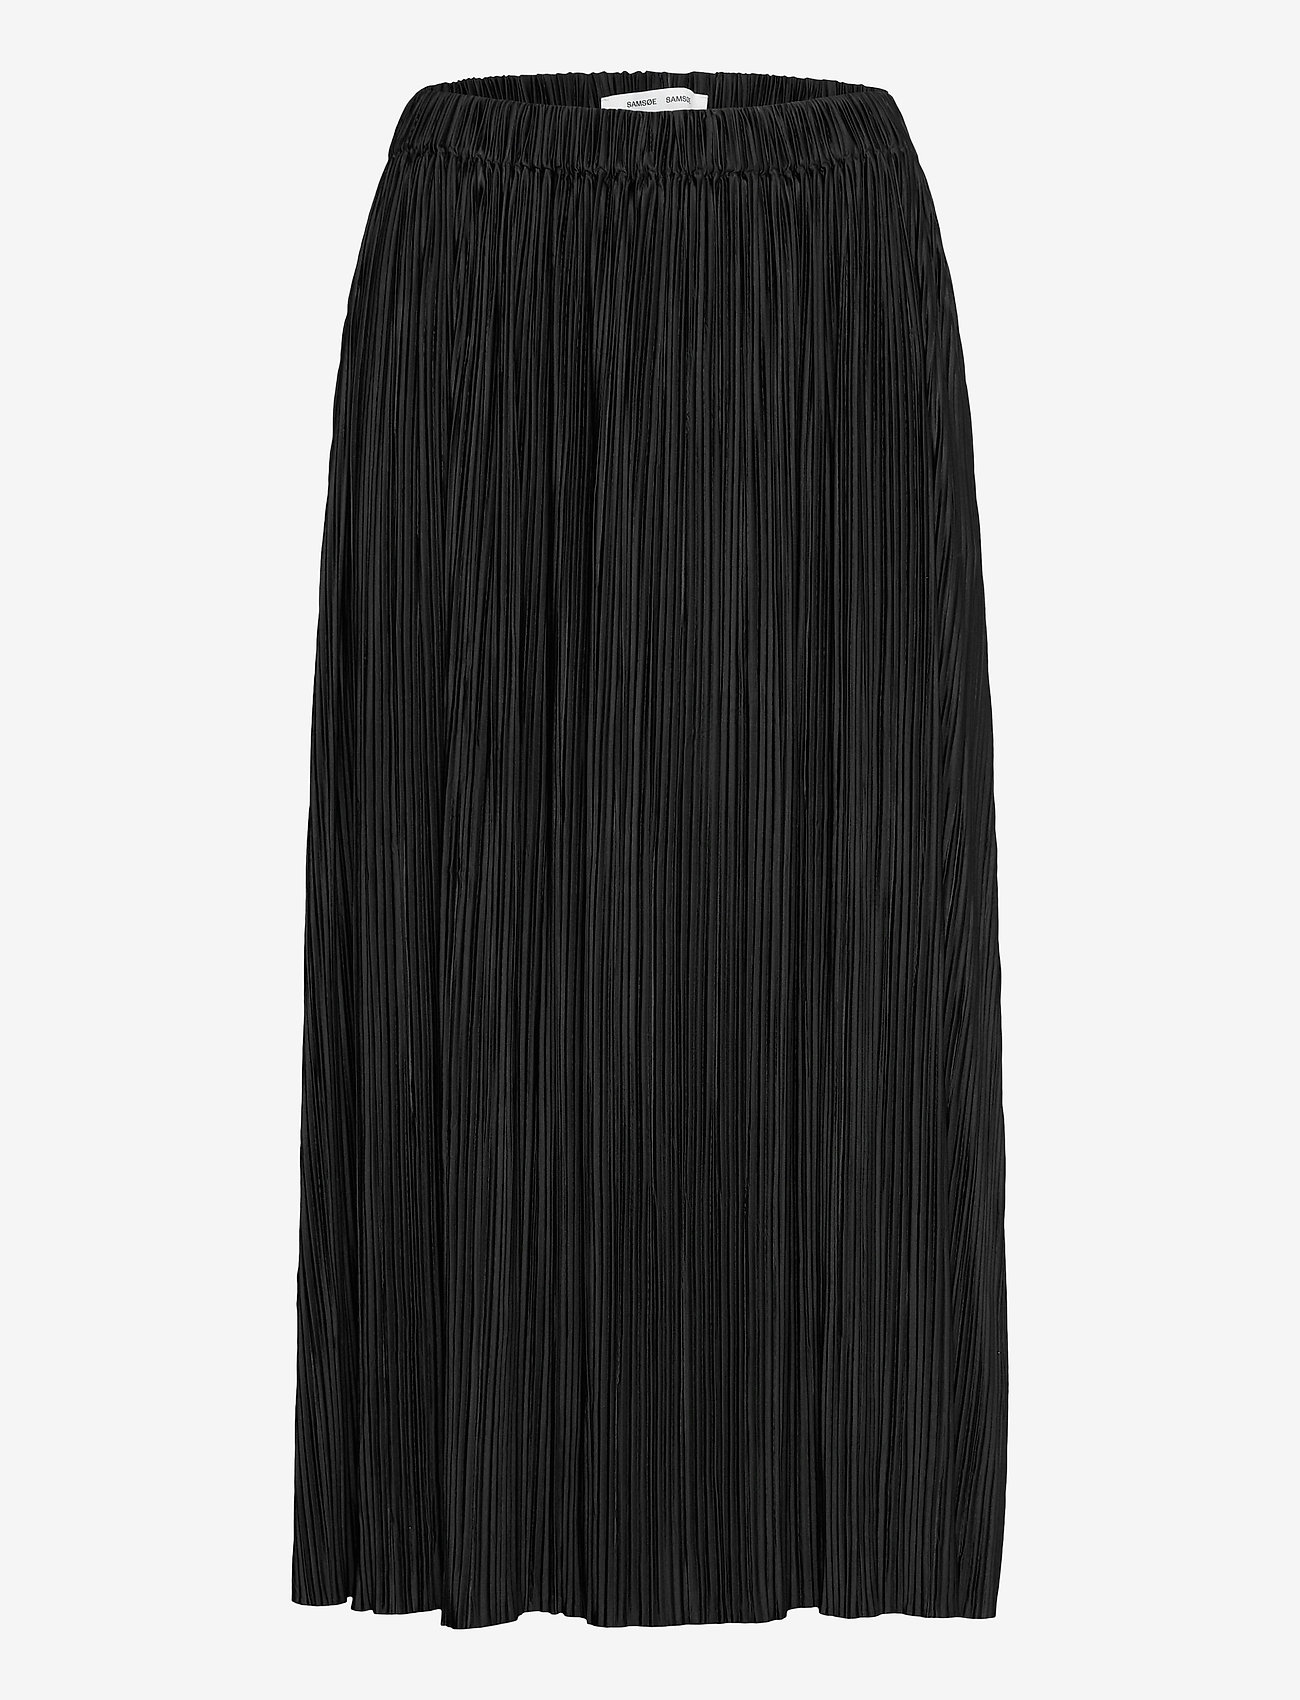 Samsøe Samsøe - Uma skirt 10167 - midi nederdele - black - 0